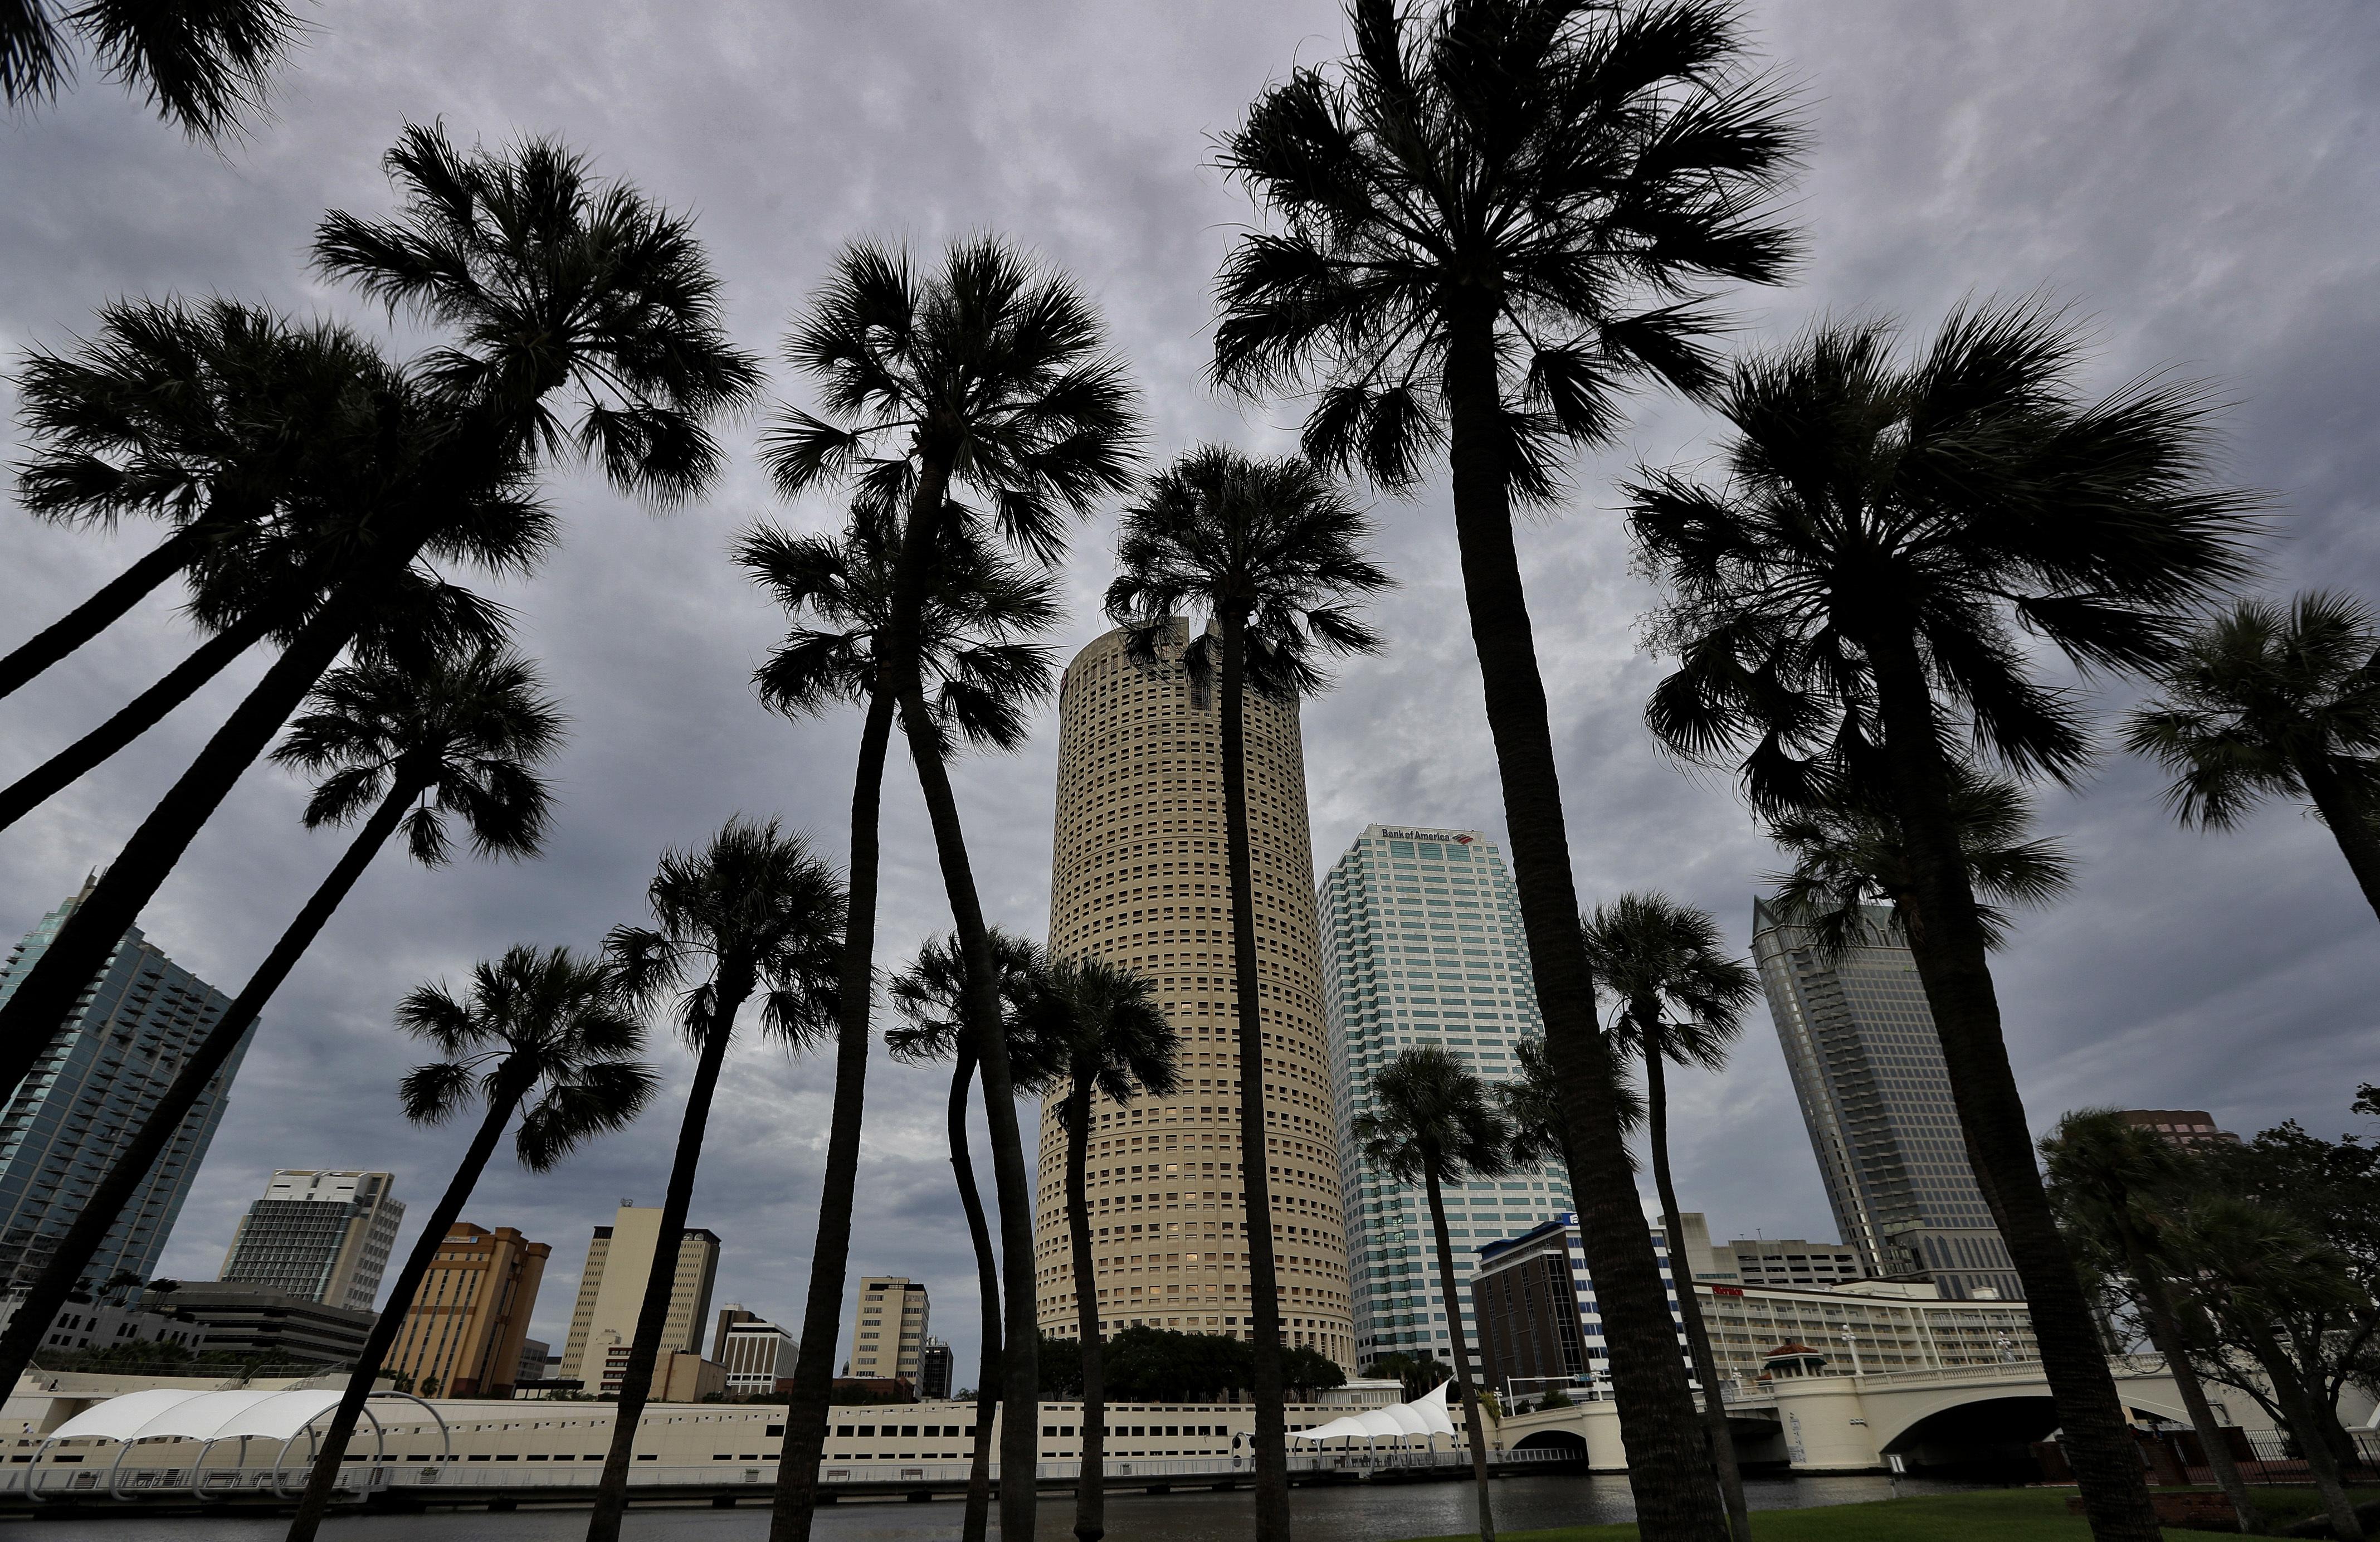 Tampa: Hurricane Irma has taken a turn toward Tampa Bay area